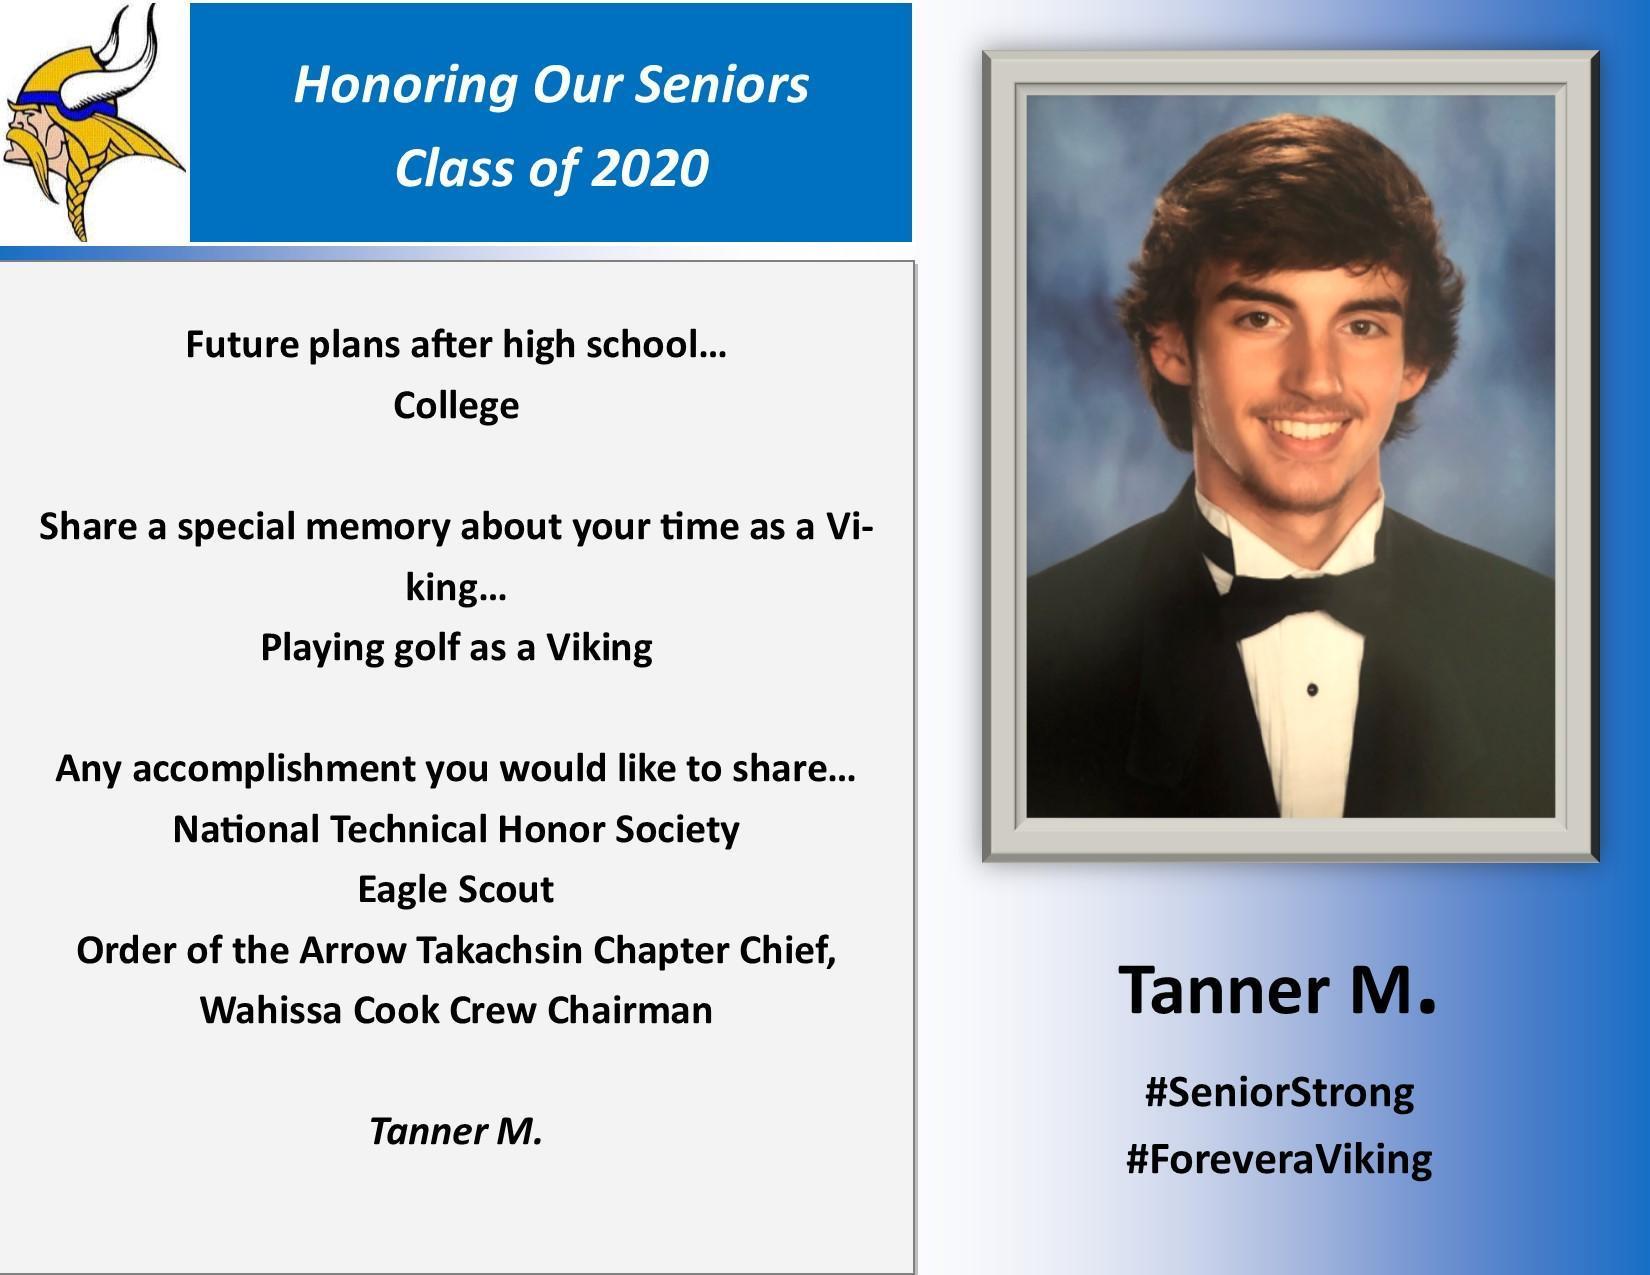 Tanner M